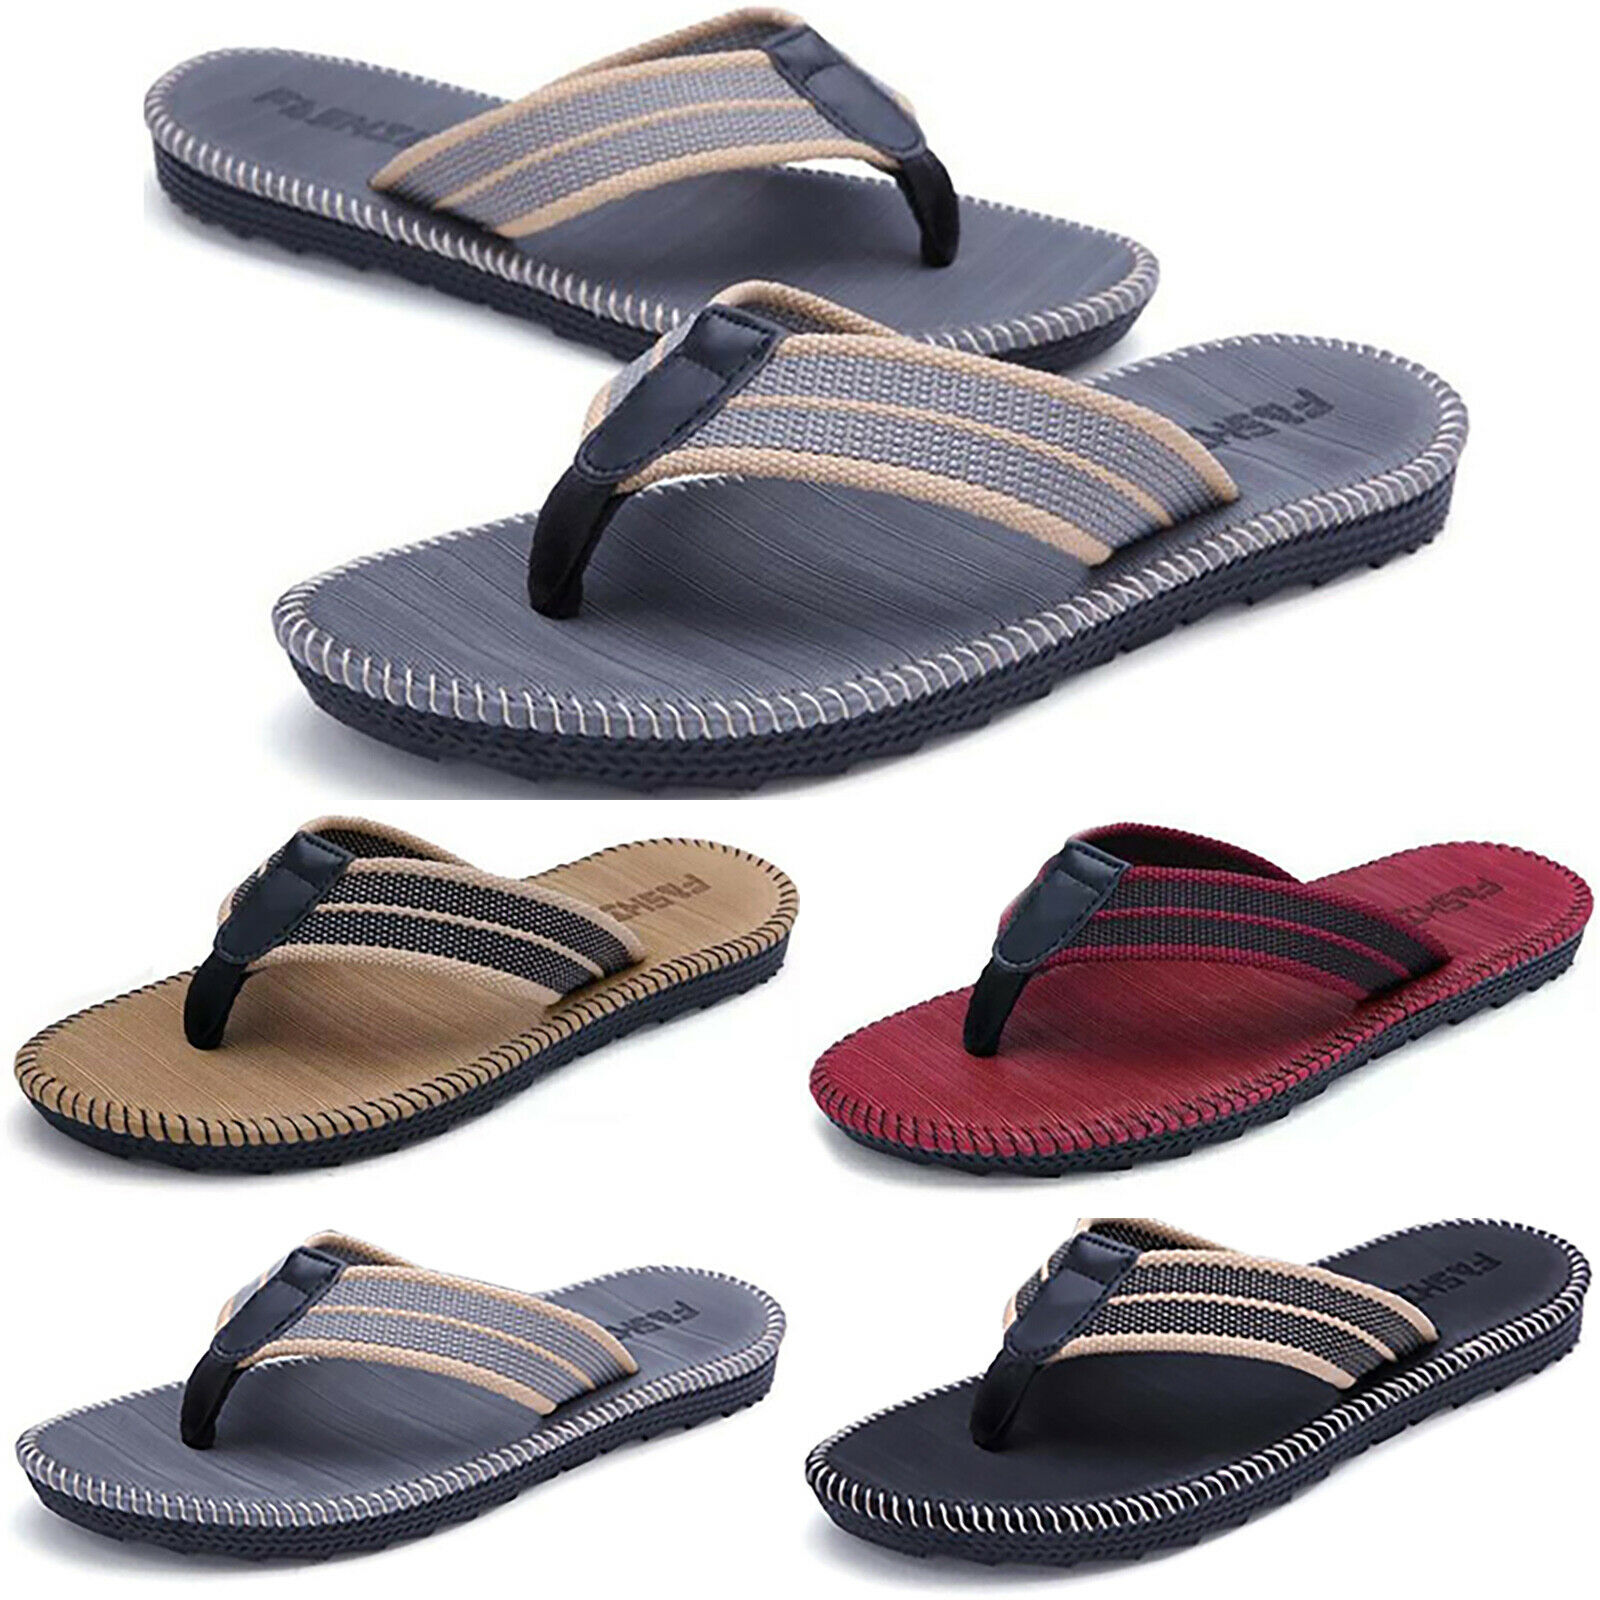 Men's Sandals Flip Flops Beach Pool Thongs Casual Summer Sport Shower Slippers